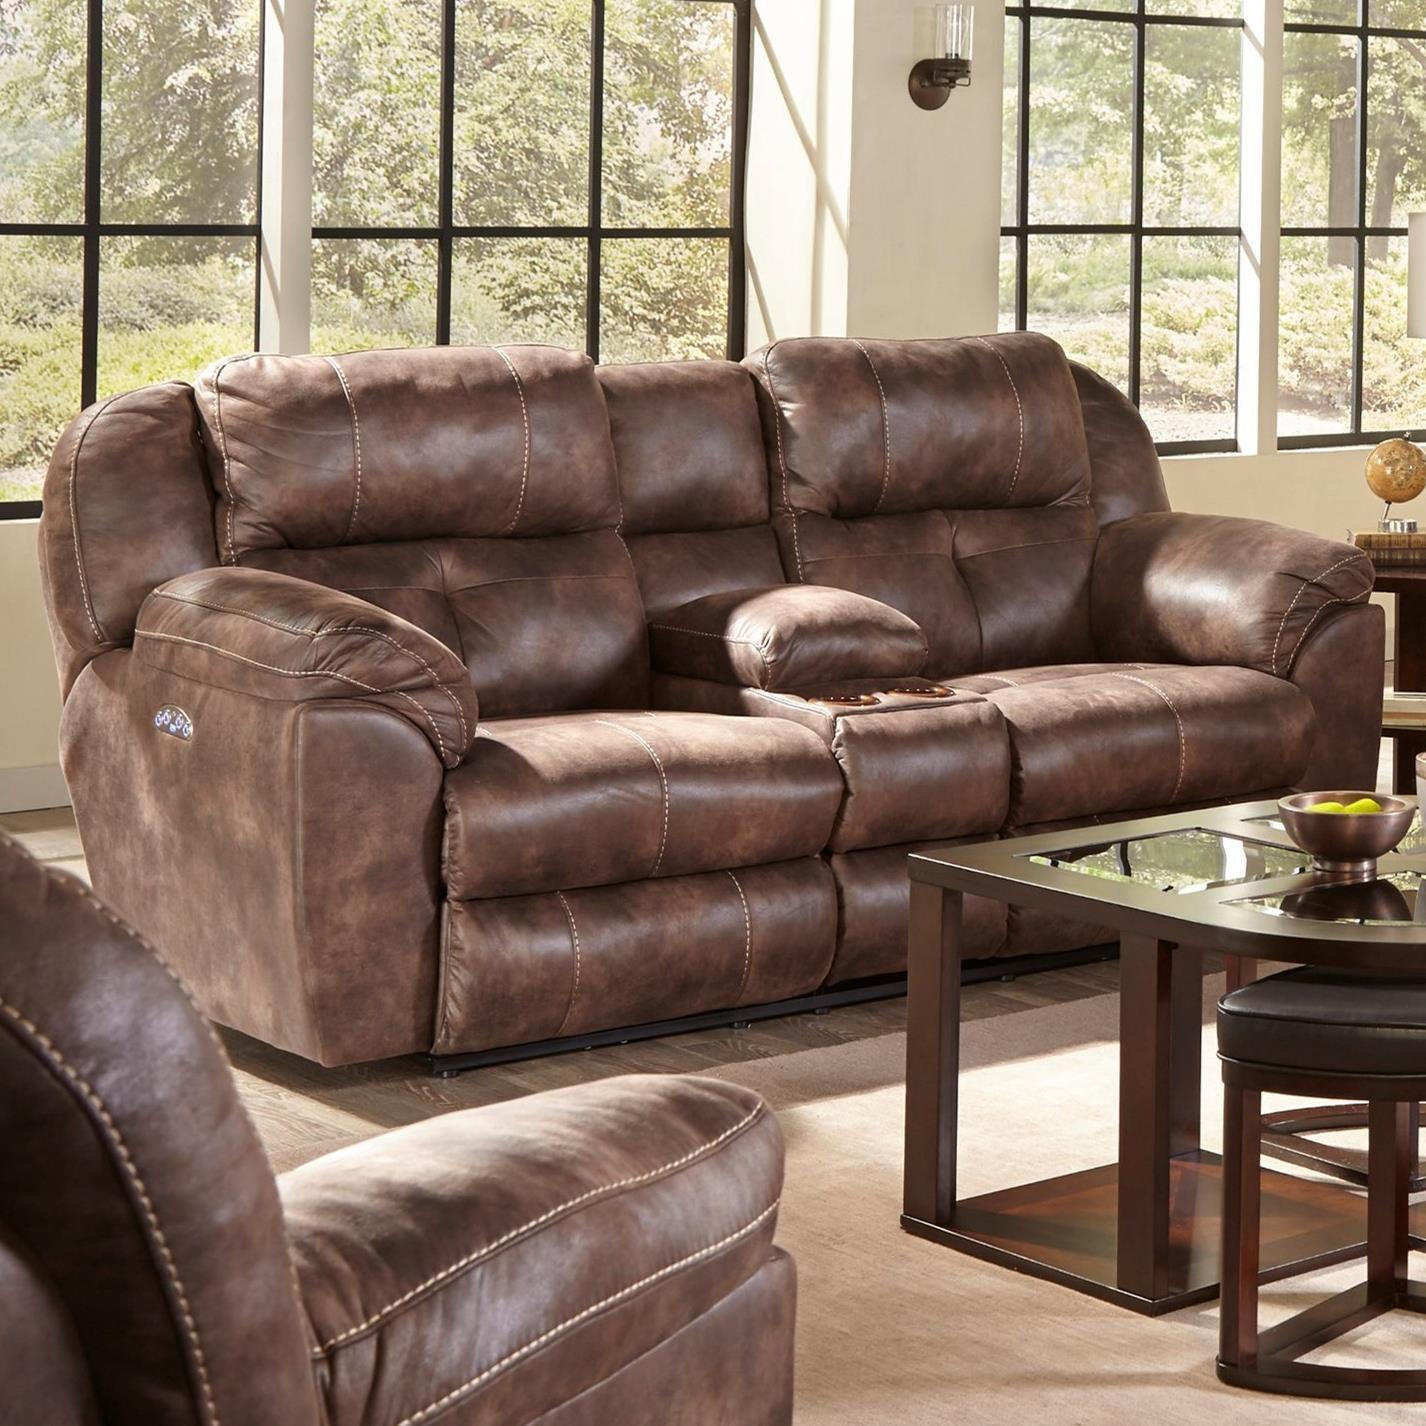 Ferrington Power Lay Flat Reclining Living Room Set Dusk: Catnapper Ferrington Power Headrest Lay Flat Reclining